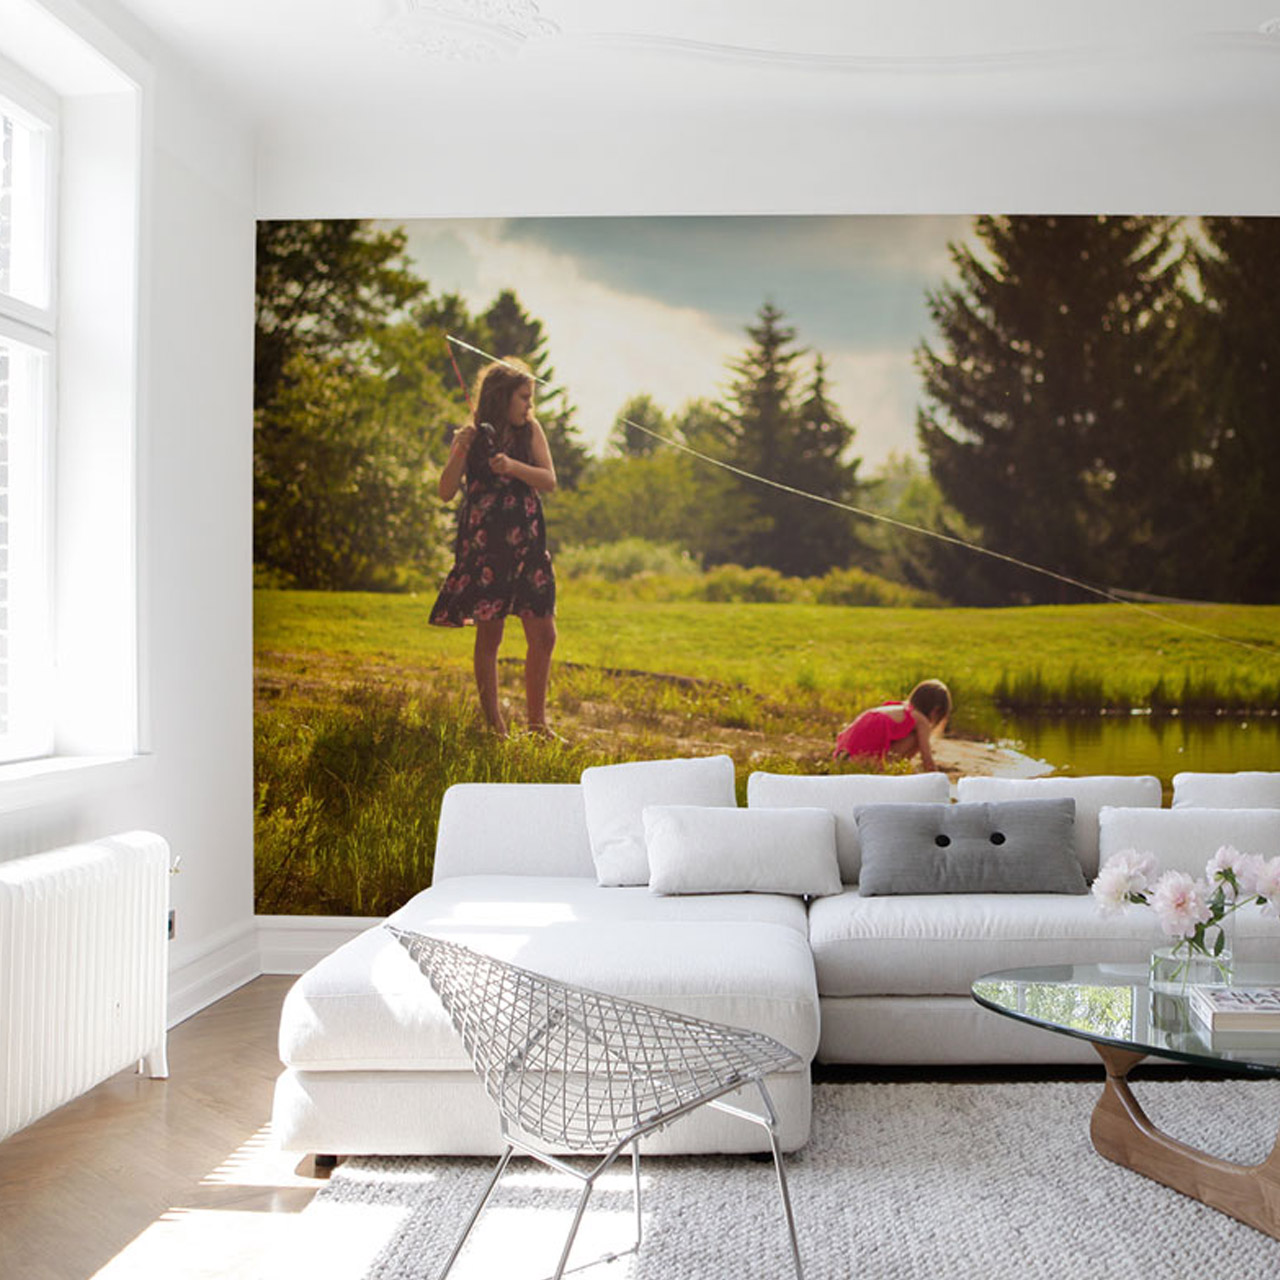 Papel De Parede Fotogr Fico S Papel E Revestimento Papel De Parede -> Mural Parede Sala